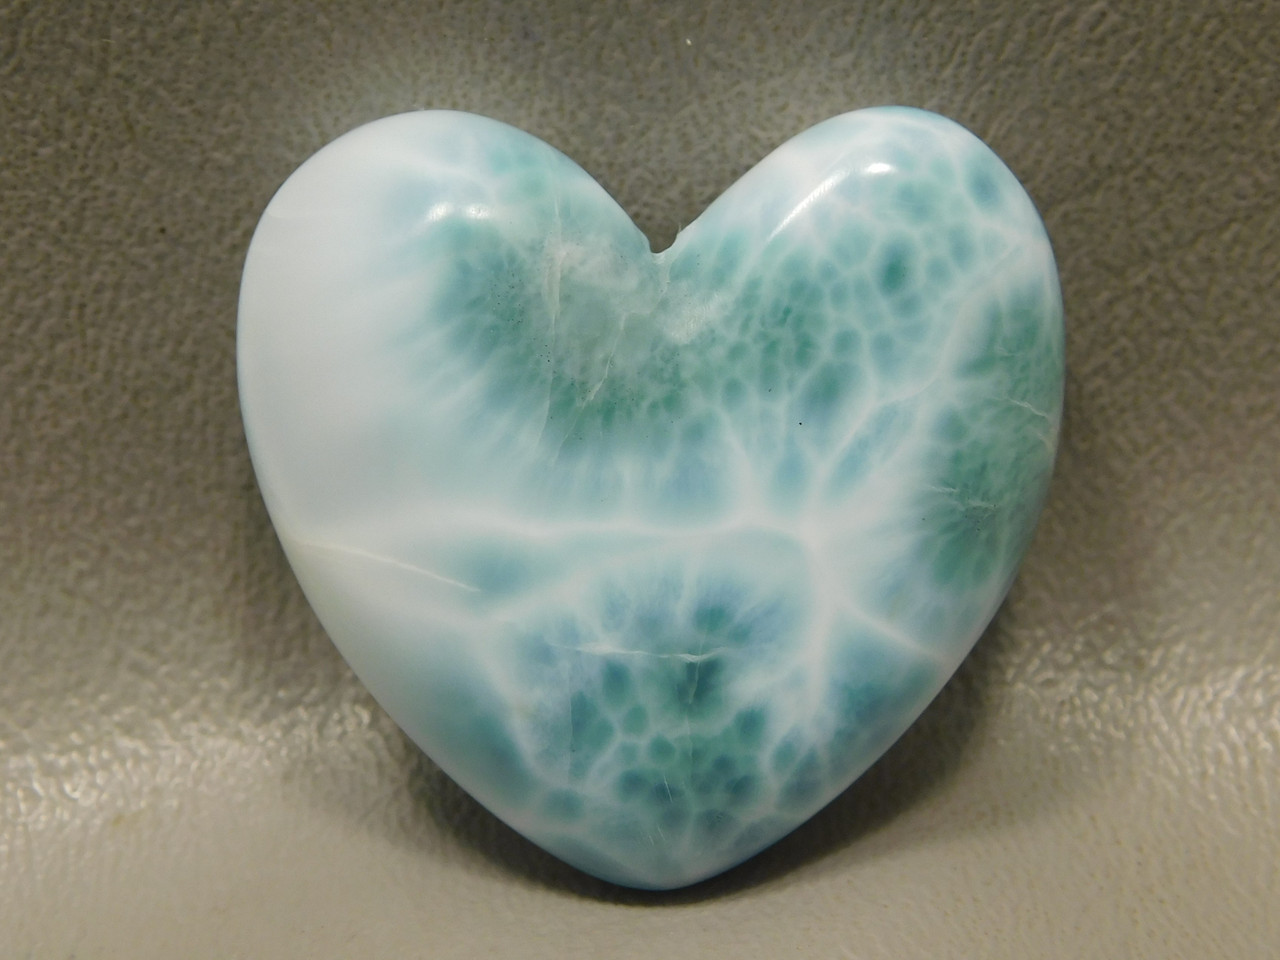 Heart Cabochon Blue Larimar Stone Jewelry Making Supplies #20